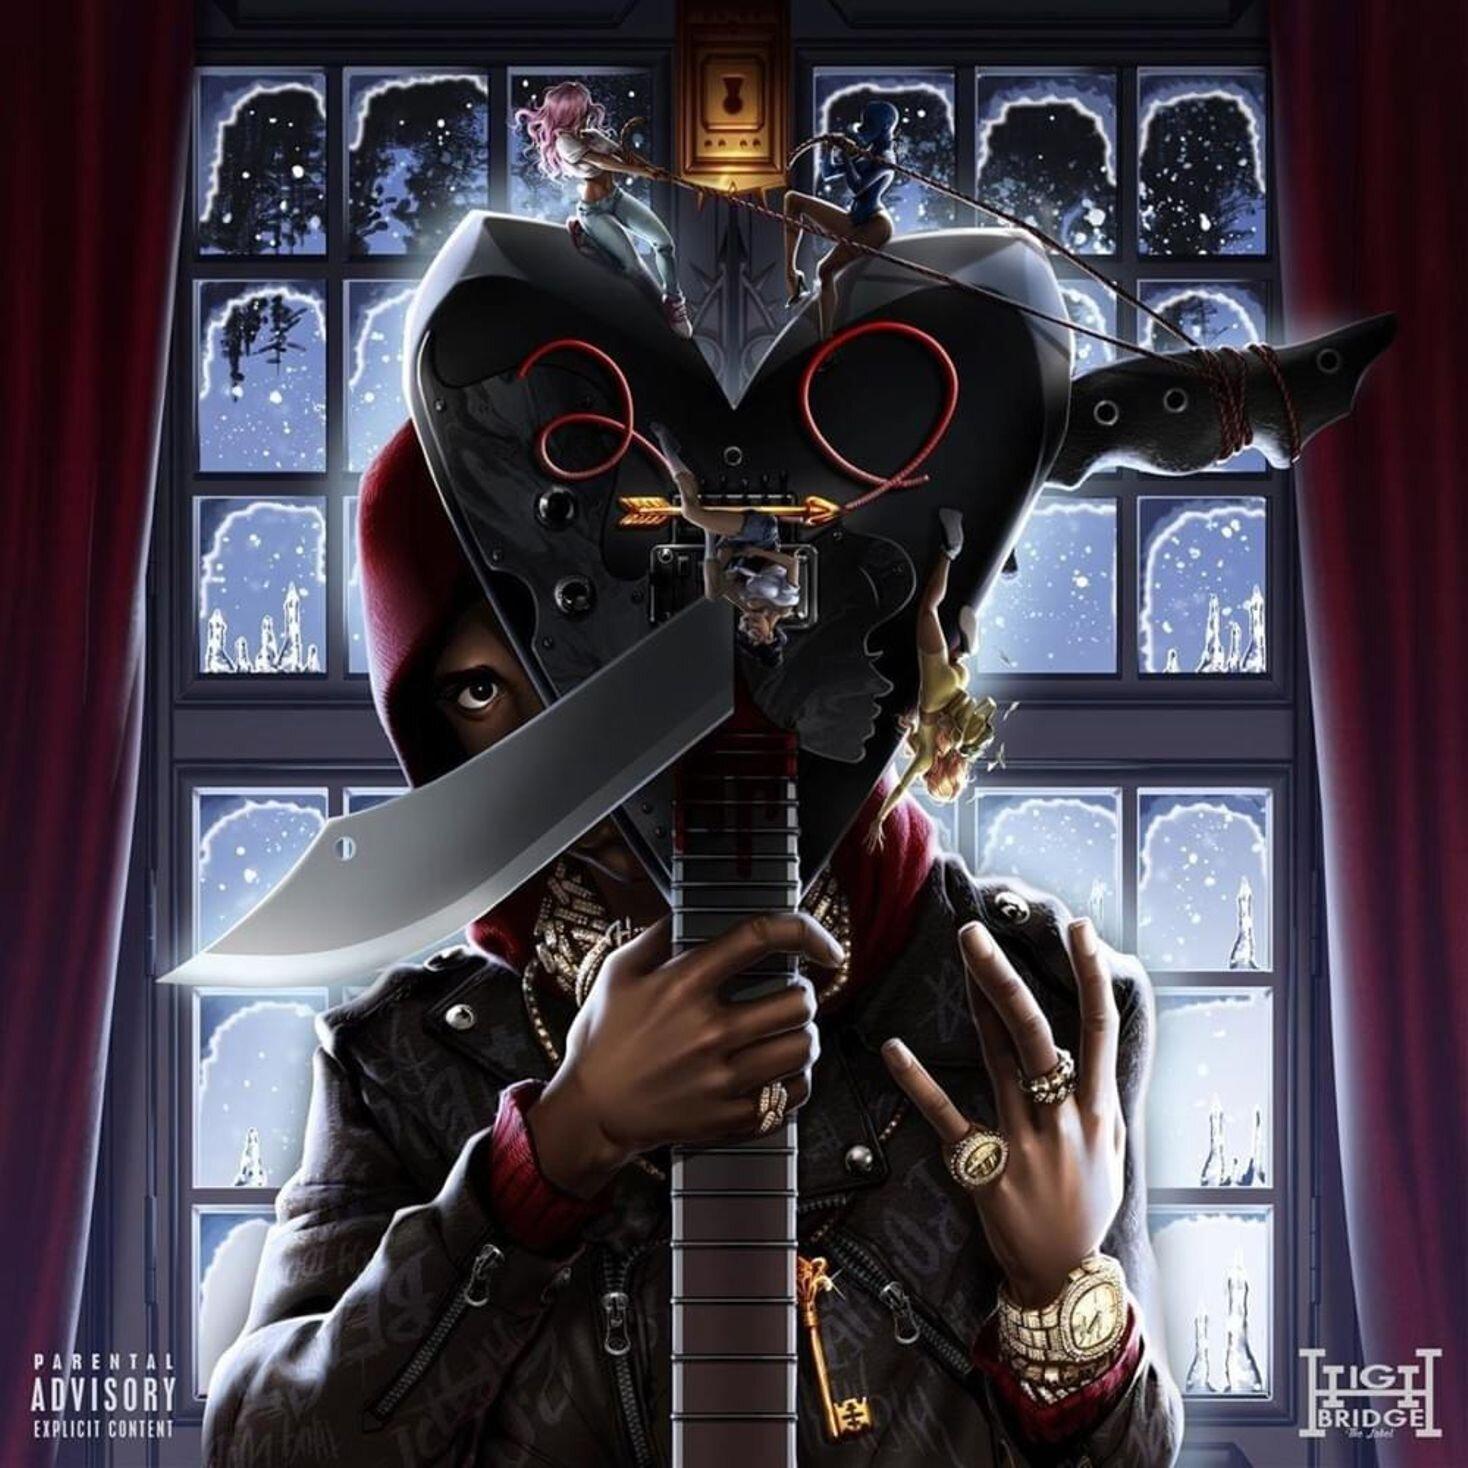 20x20 24x24 Poster A Boogie wit da Hoodie The Bigger Artist Album Cover K-677